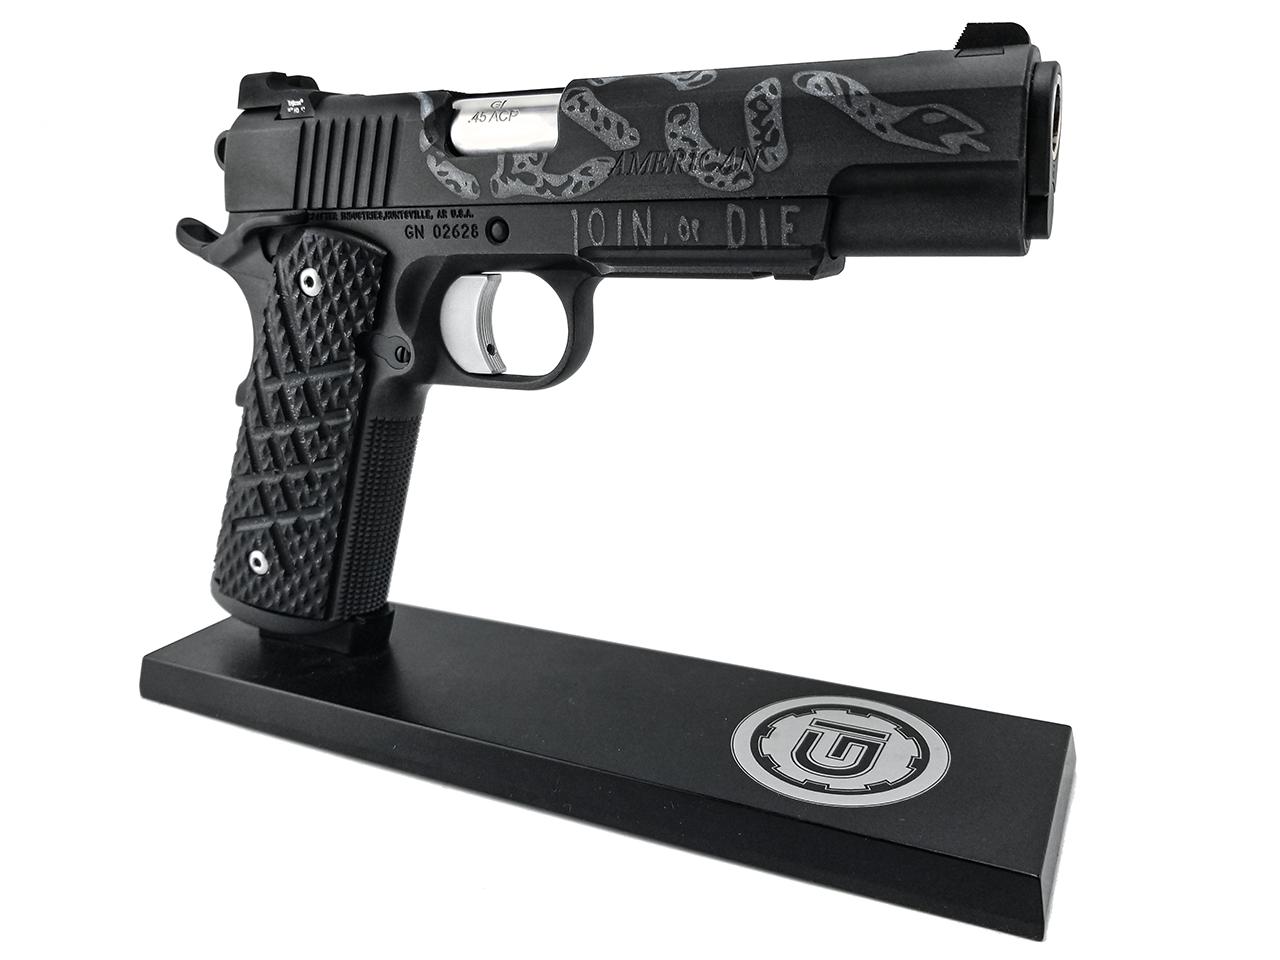 Guncrafter Industries American Custom pistol